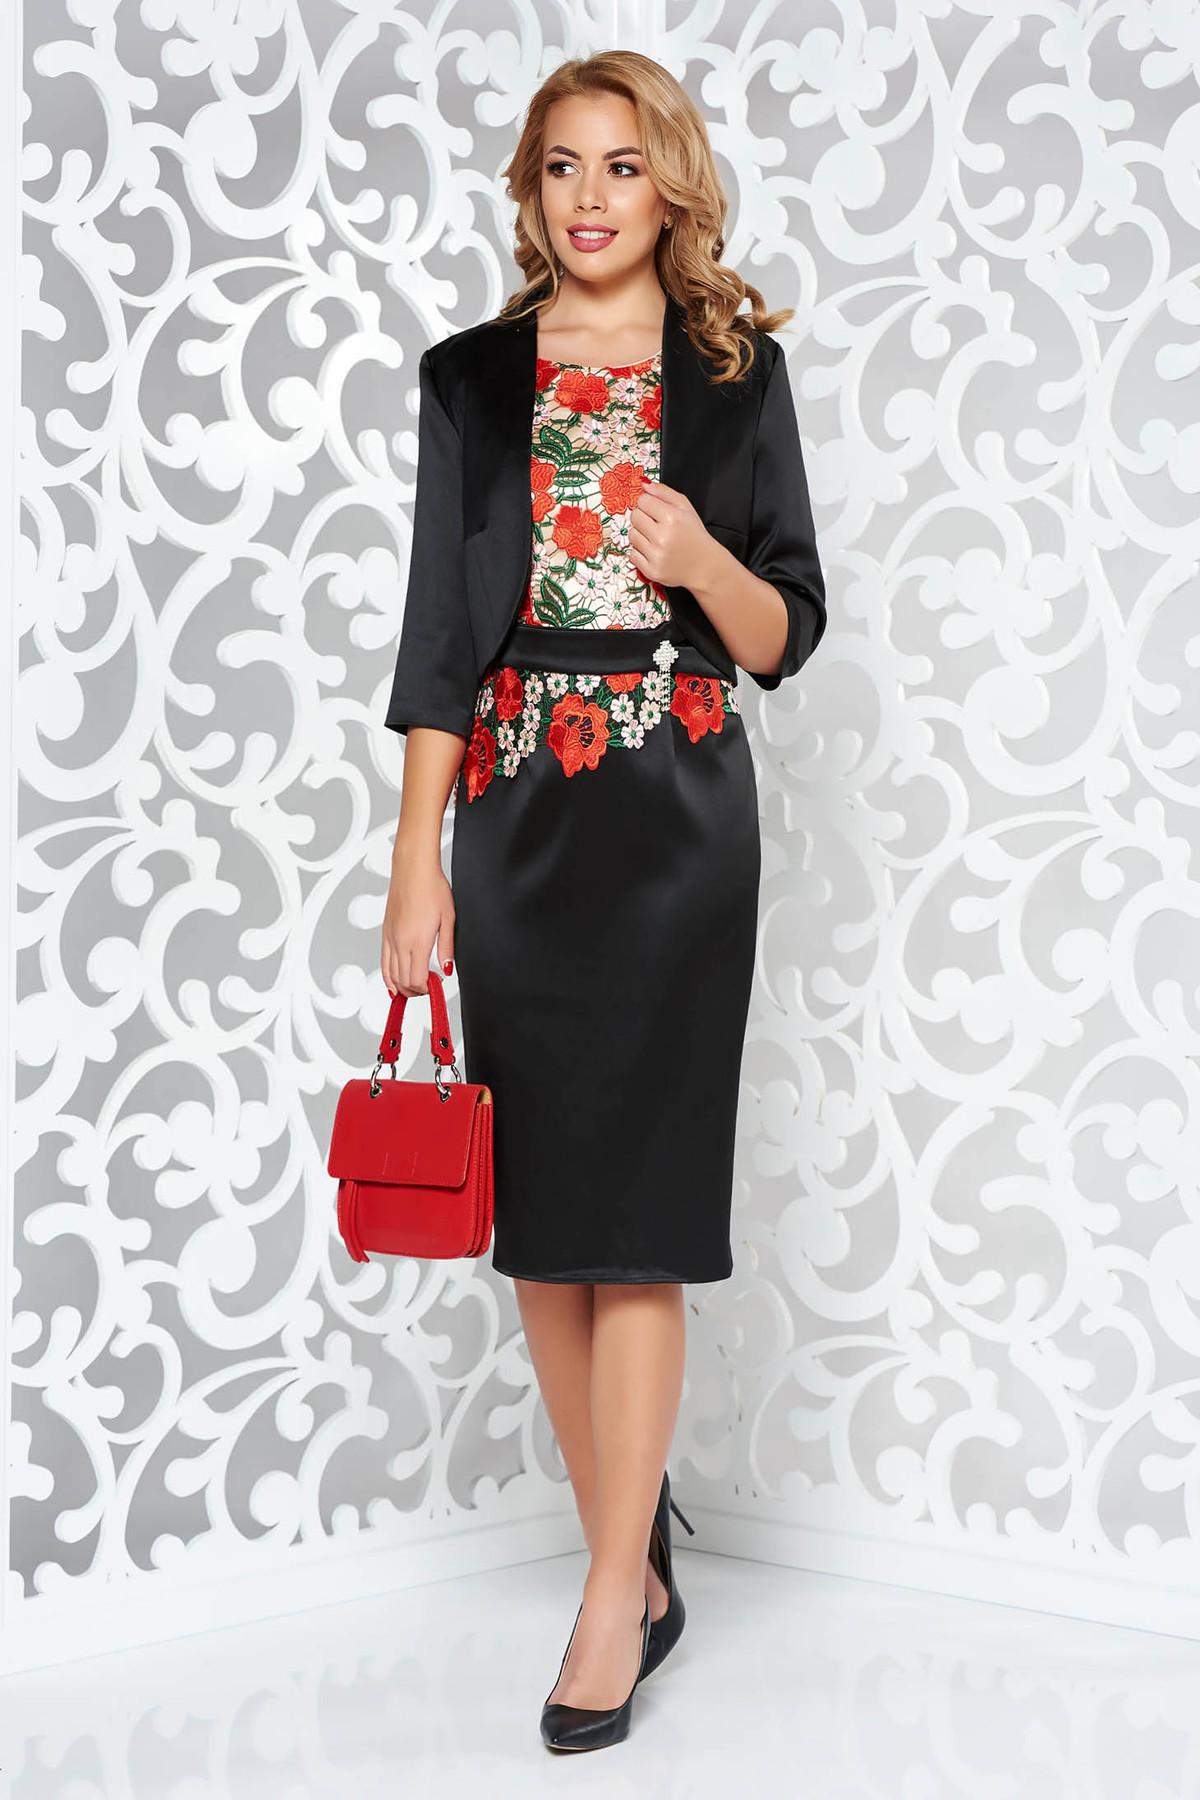 Costum Dama Negru Elegant Cu Un Croi Mulat Din Material Satinat Captusit Pe Interior Cu Insertii De Broderie